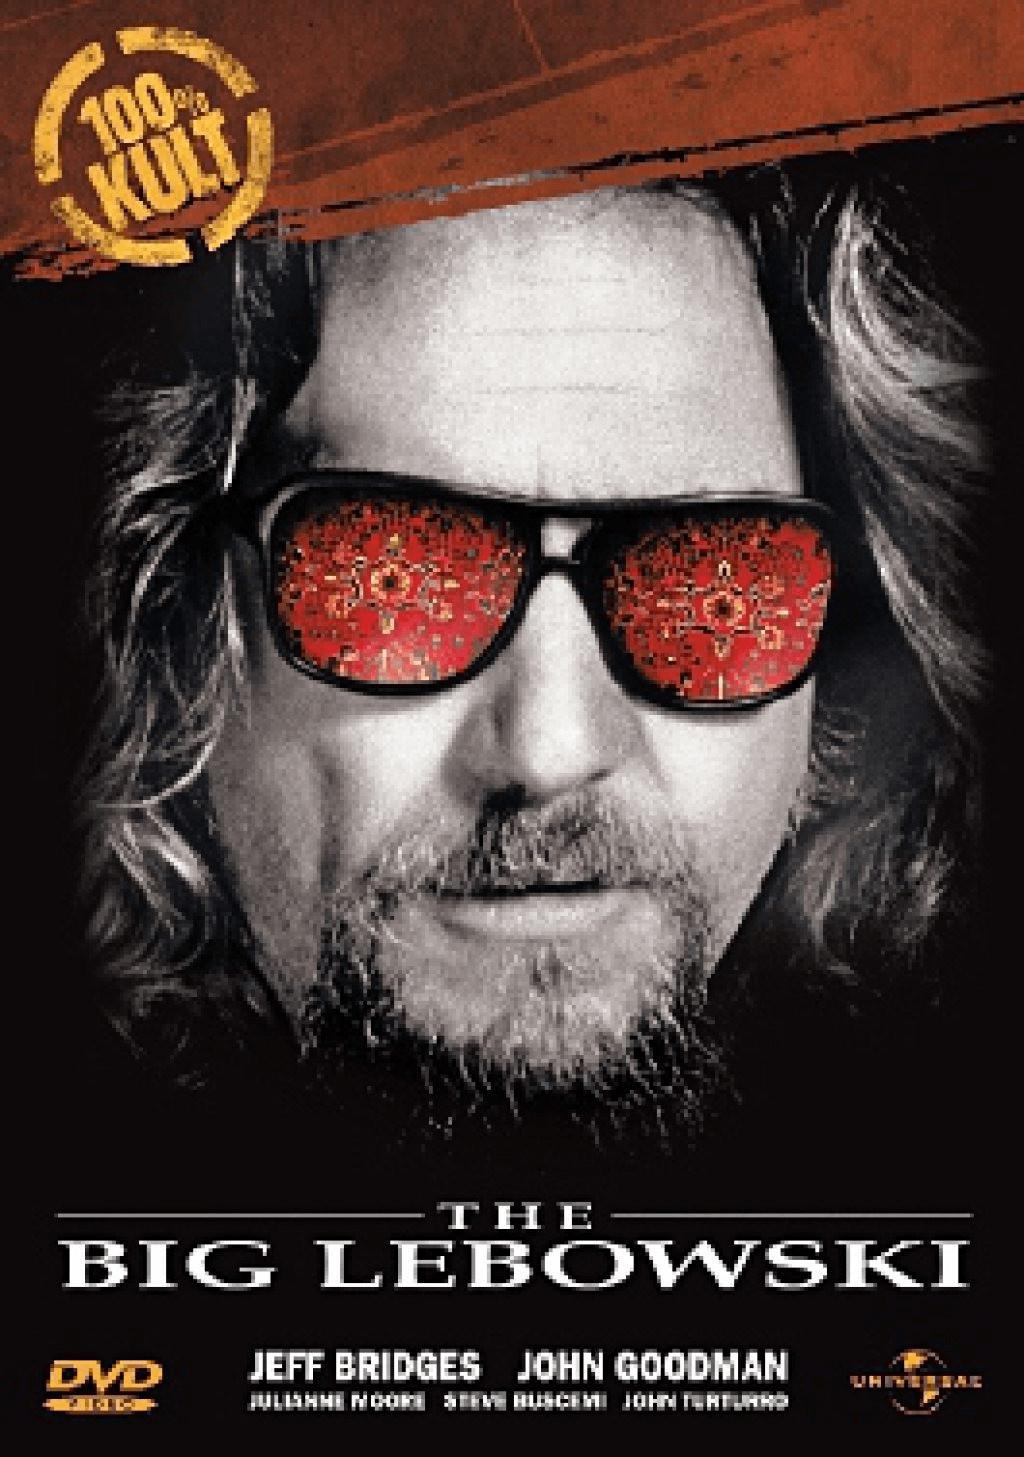 The Big Lebowski [DVD]